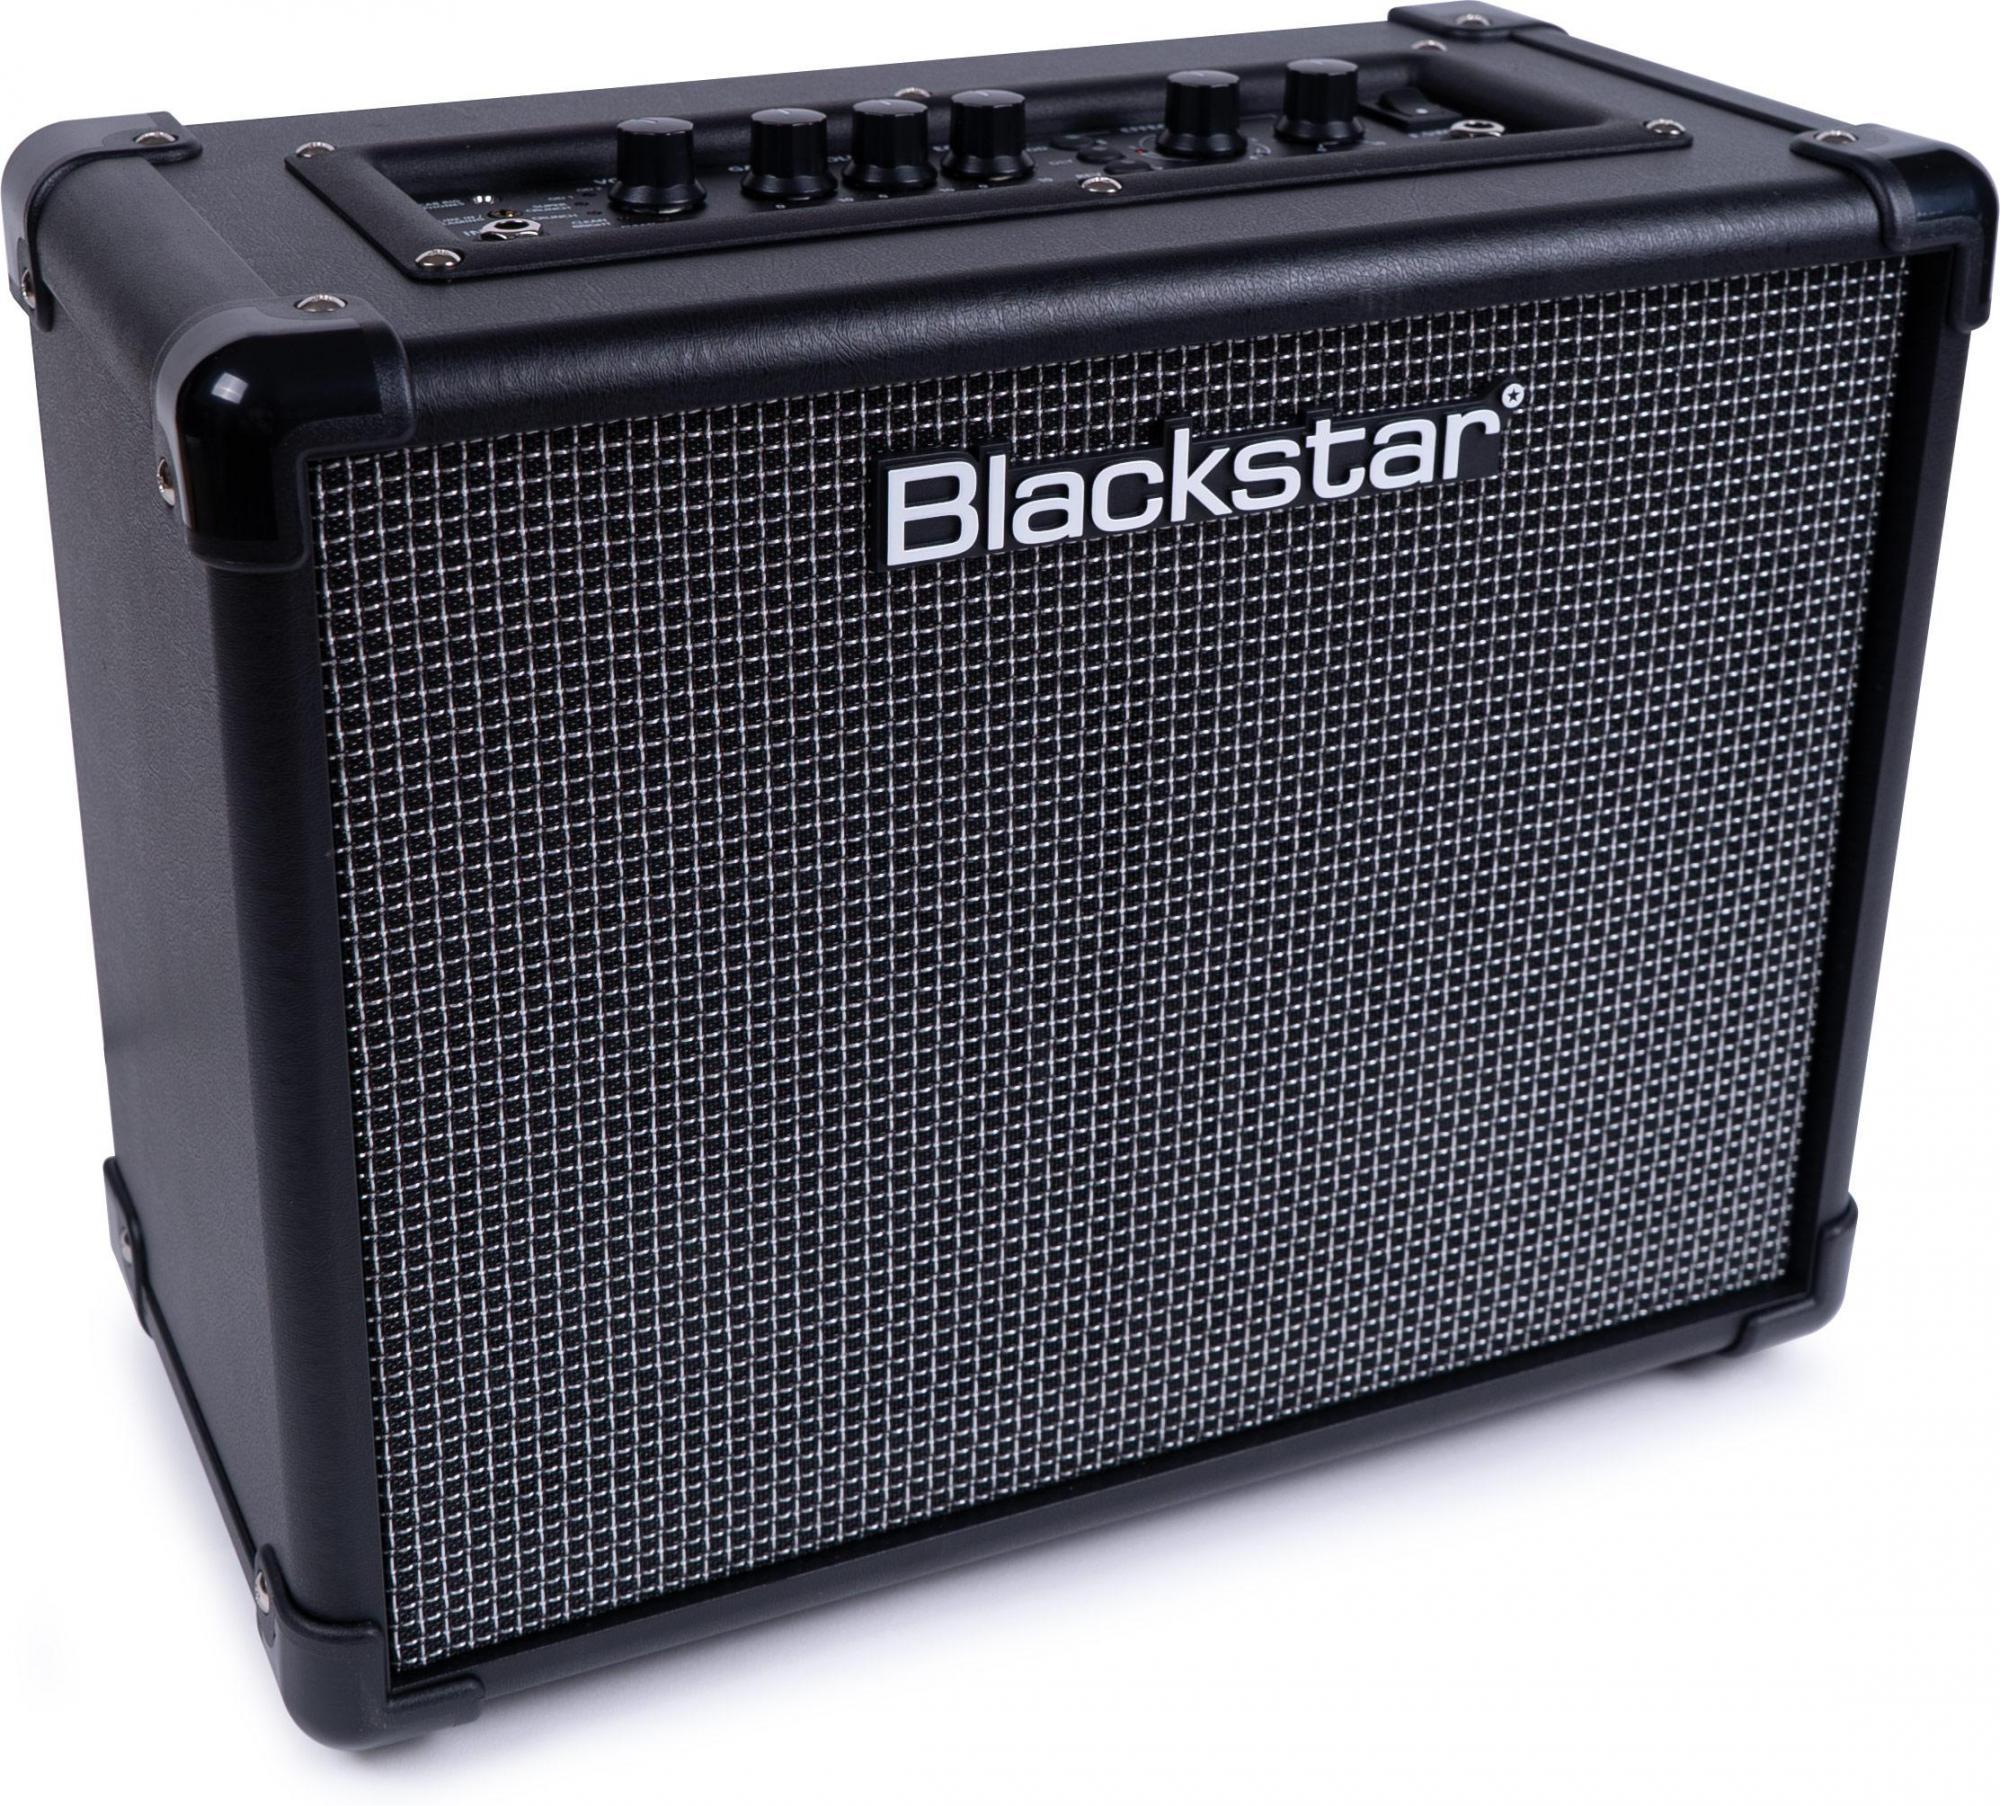 ID:Core 20 V3 Stereo Black